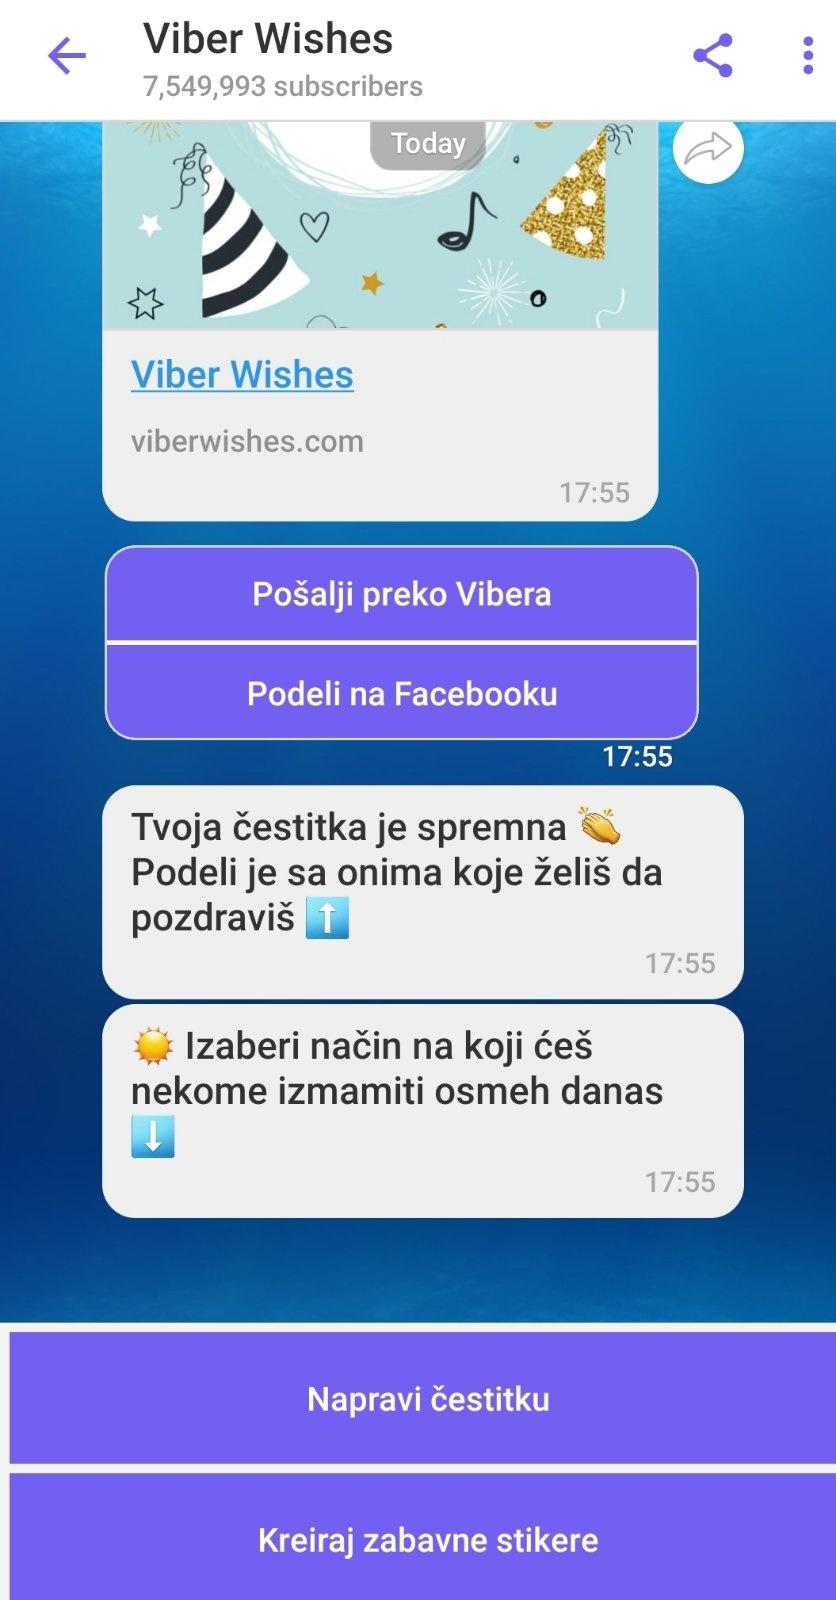 Viber Wishes Srbija chat bot - ITNetwork